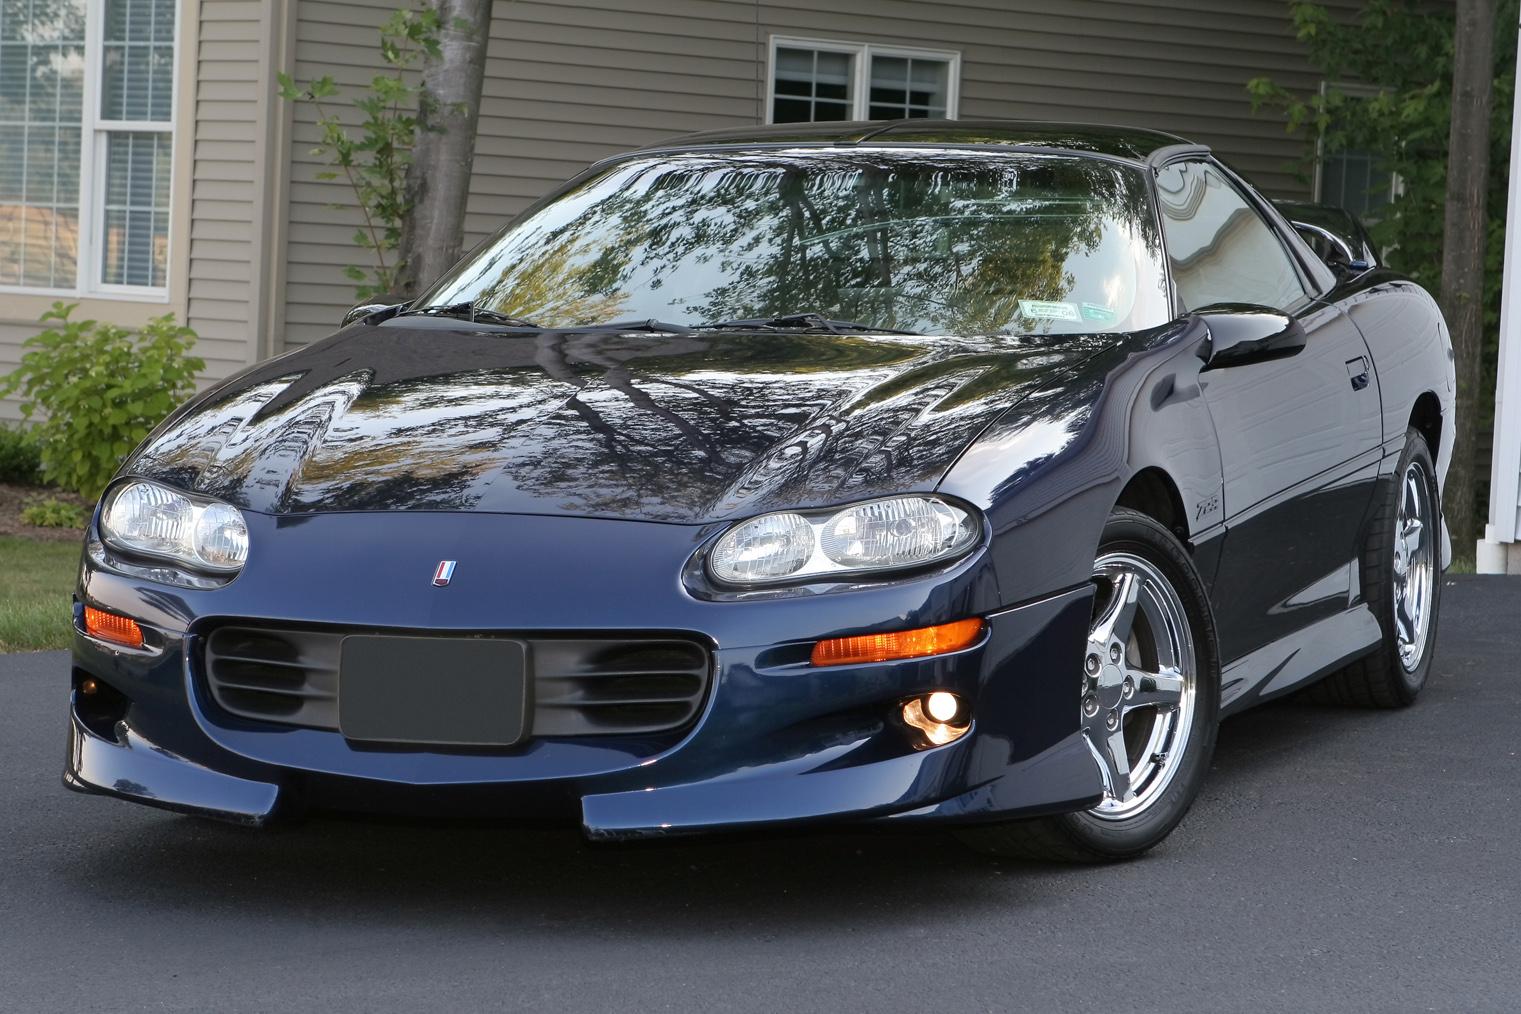 1998 Camaro Z28 T-Tops -- Superb condition! - CamaroZ28 ...